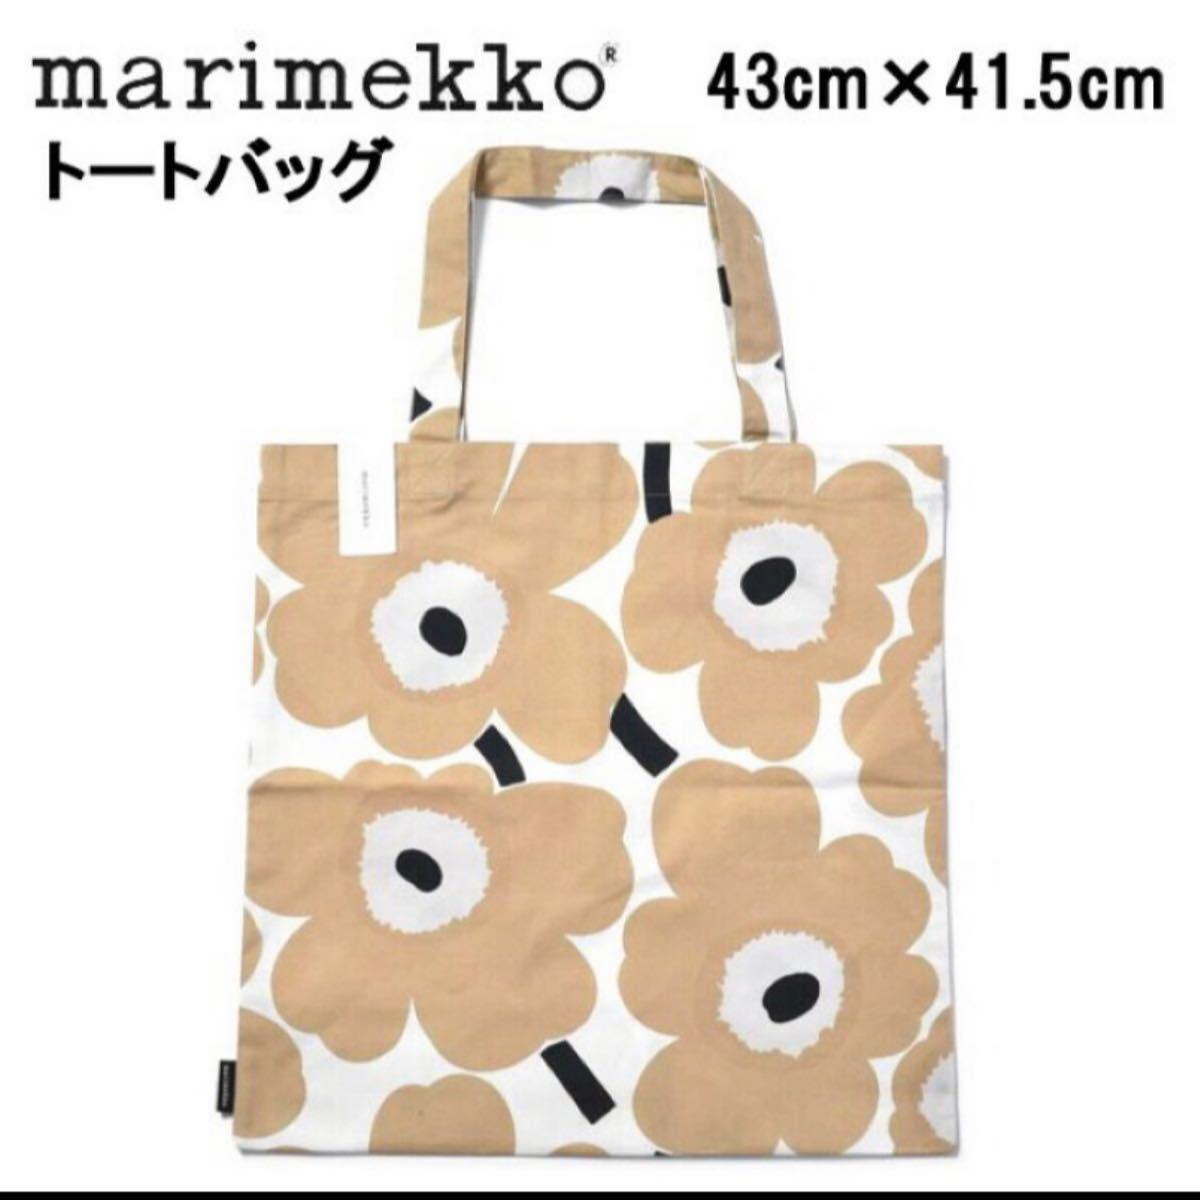 marimekko再入荷 マリメッコ トートバッグエコファブリック新品ベージュ